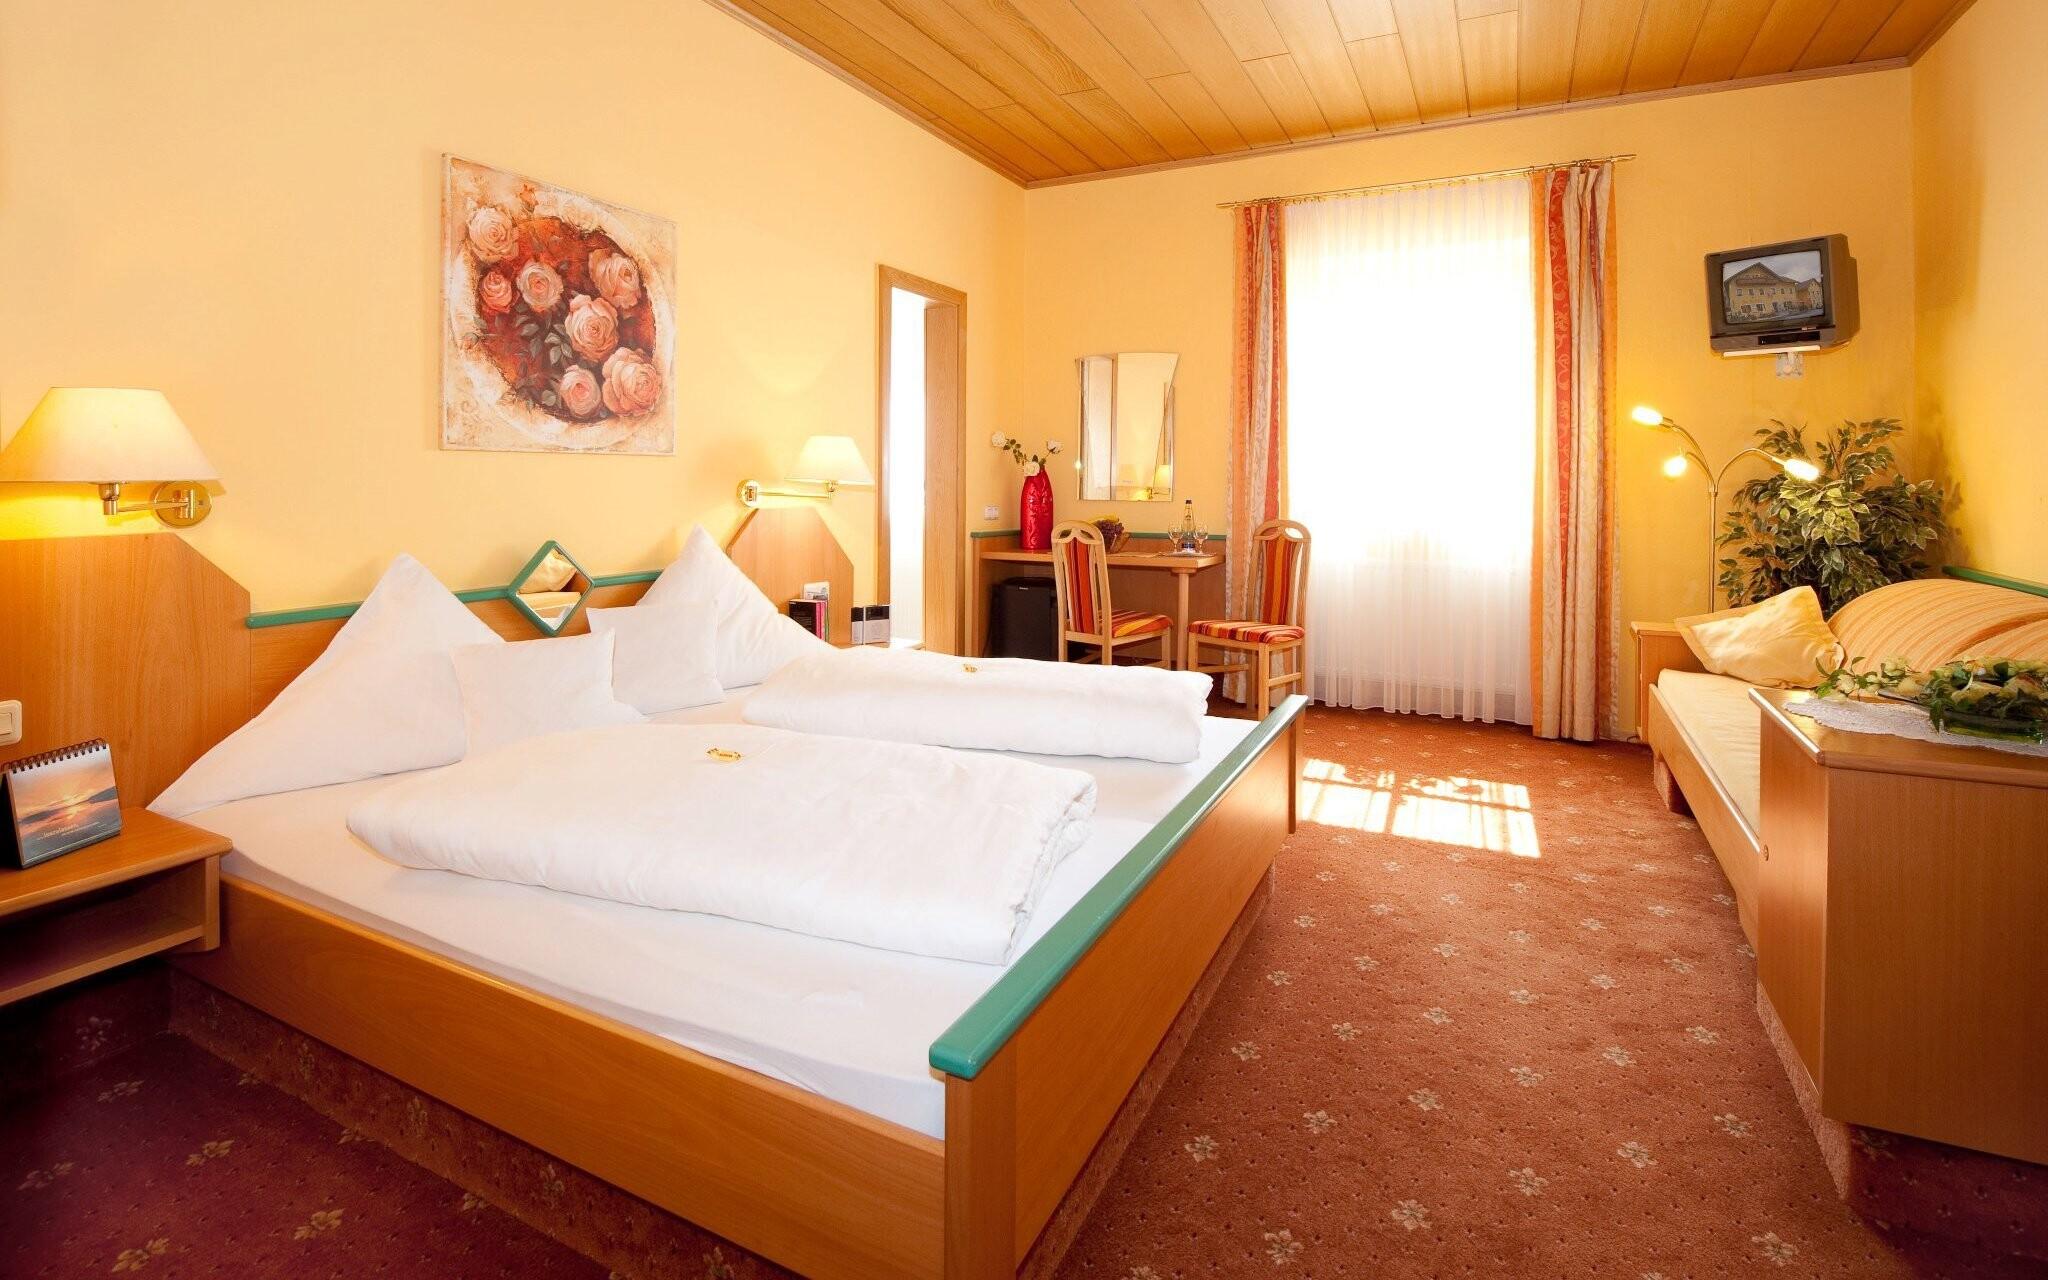 Pokoj, Hotel Rösslwirt ***, Lam, Bavorský les, Německo